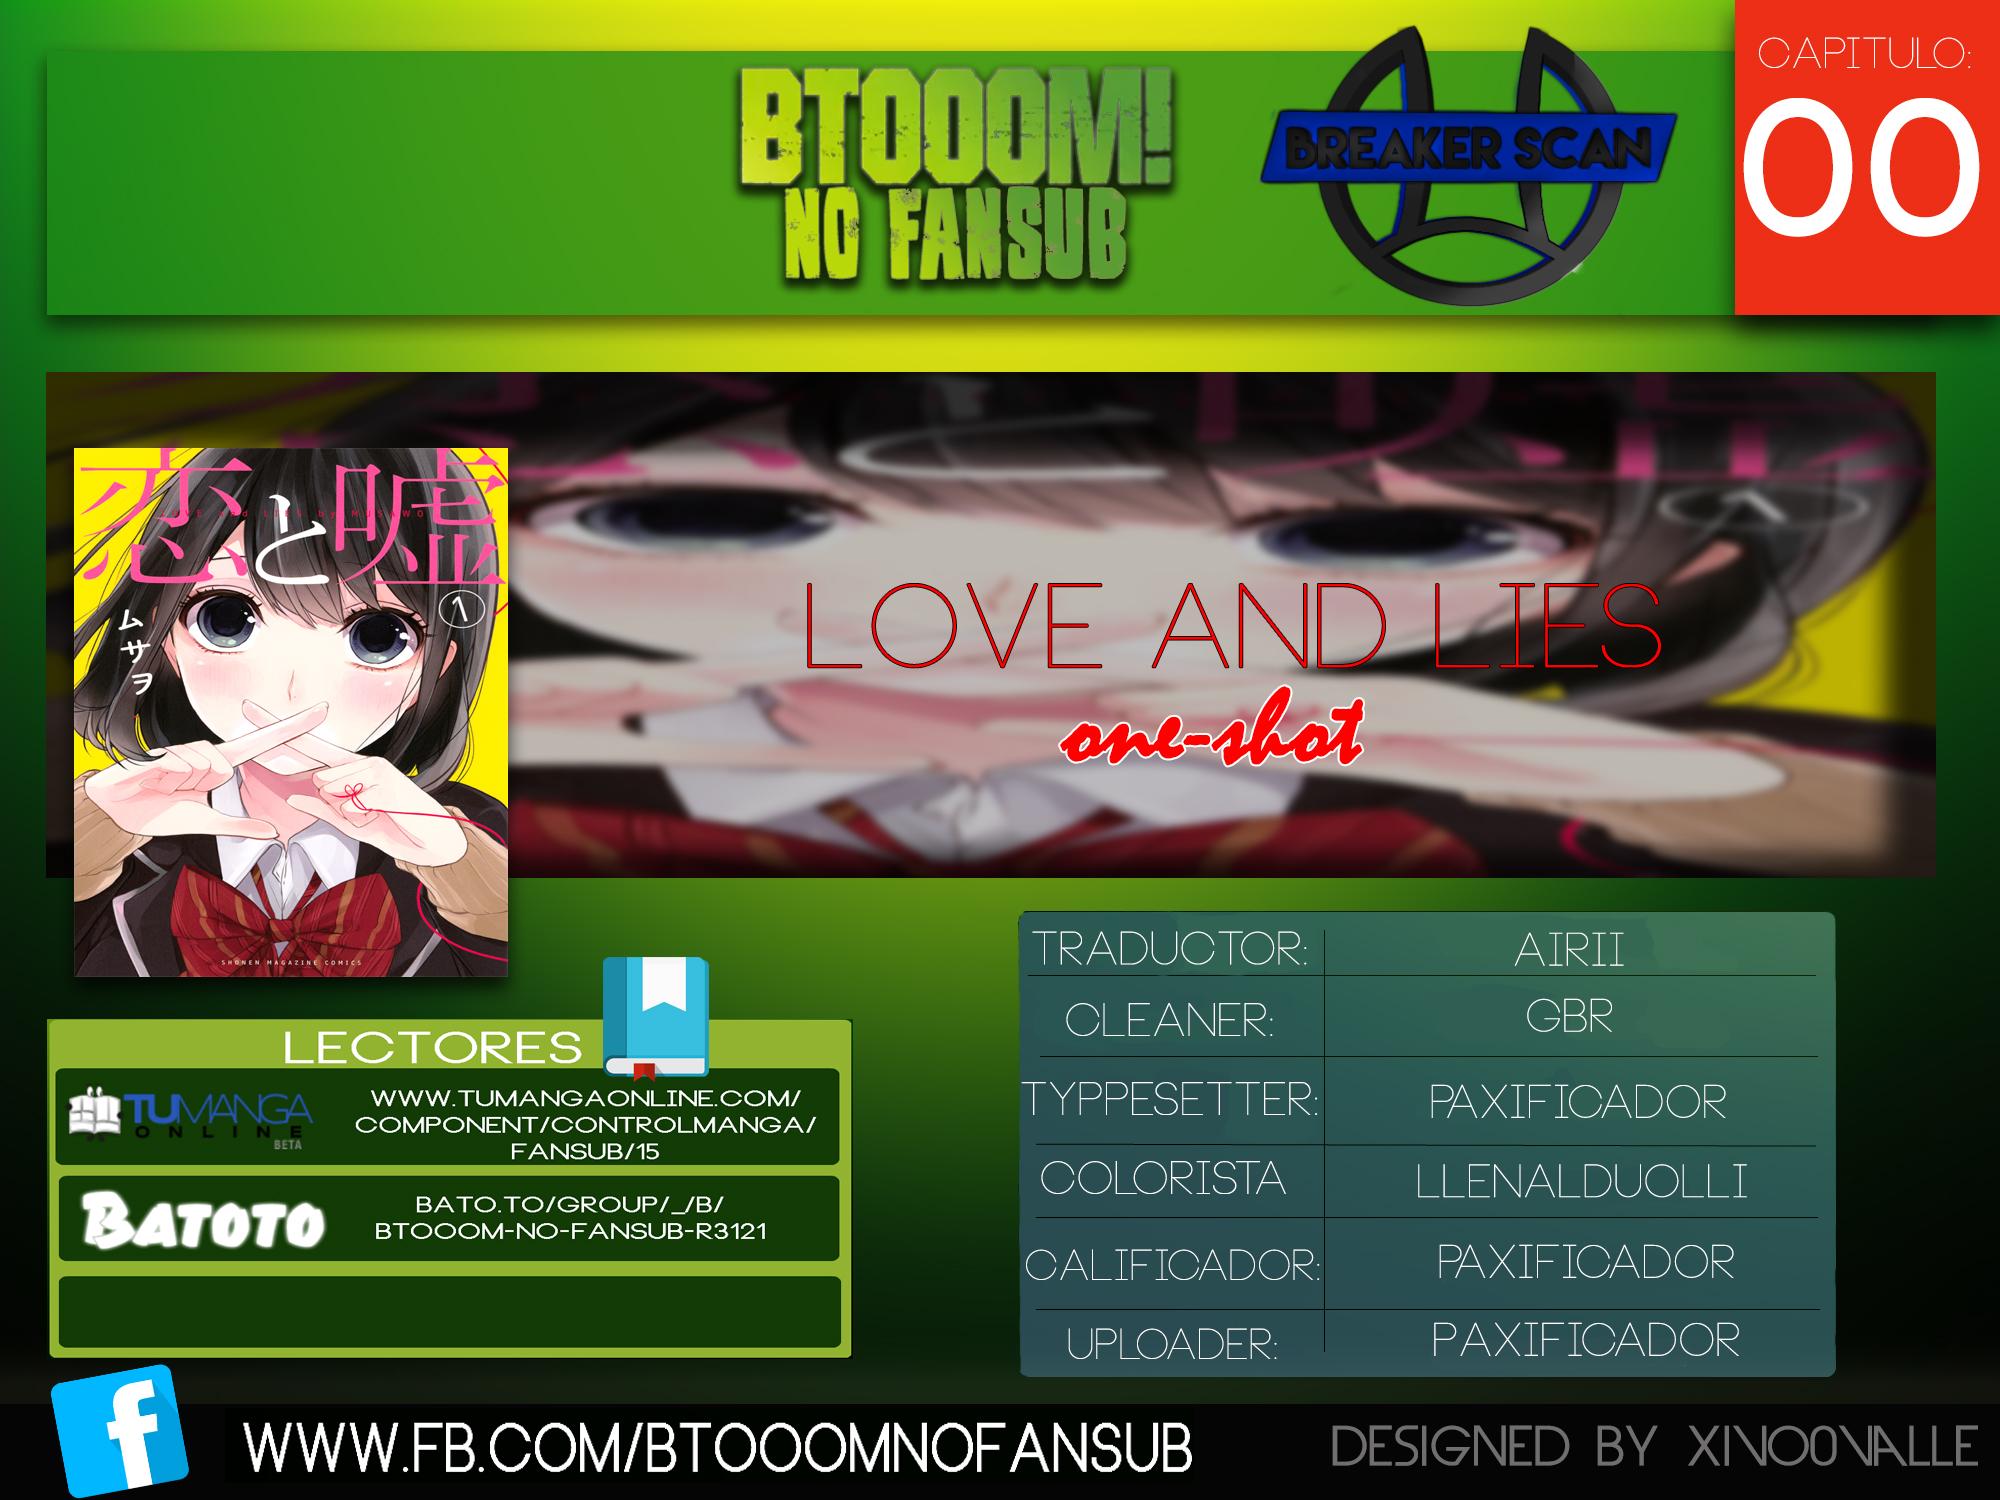 http://c5.ninemanga.com/es_manga/14/14734/393550/c591d12b9dbf597d4e38f56c674ecf0e.jpg Page 1